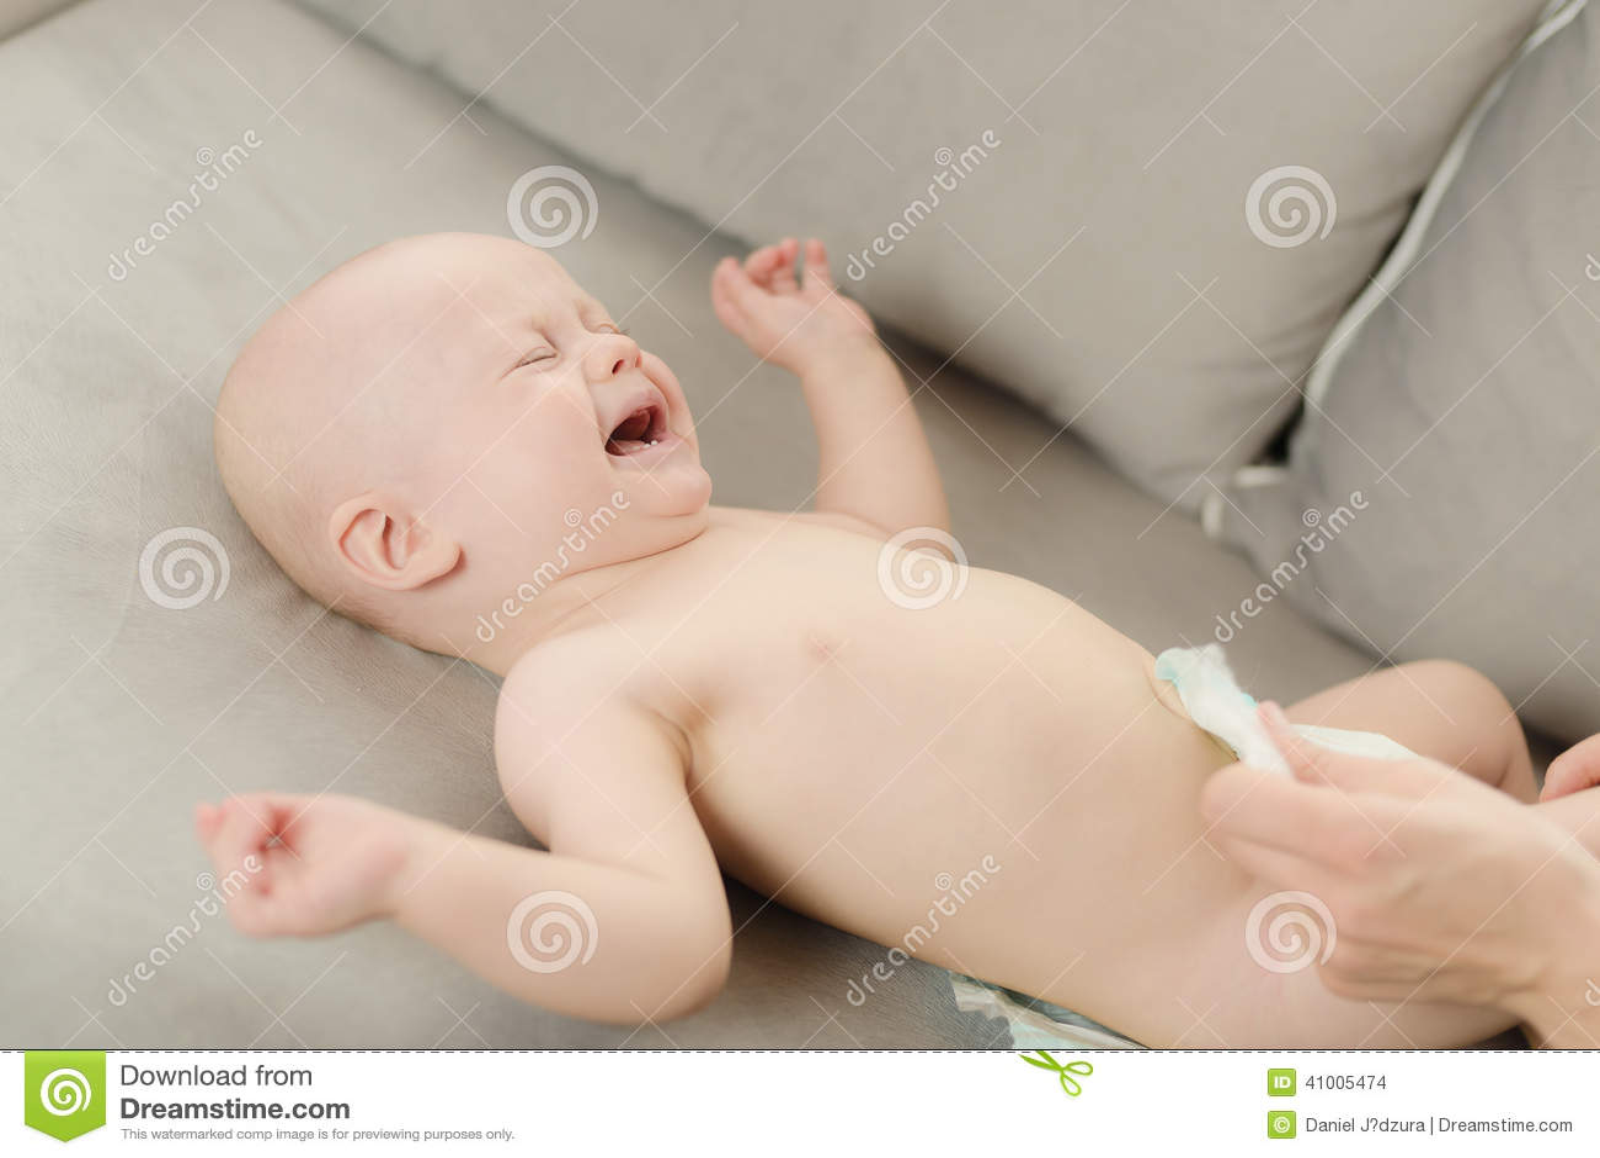 CHANGING BABY BOY DIAPER